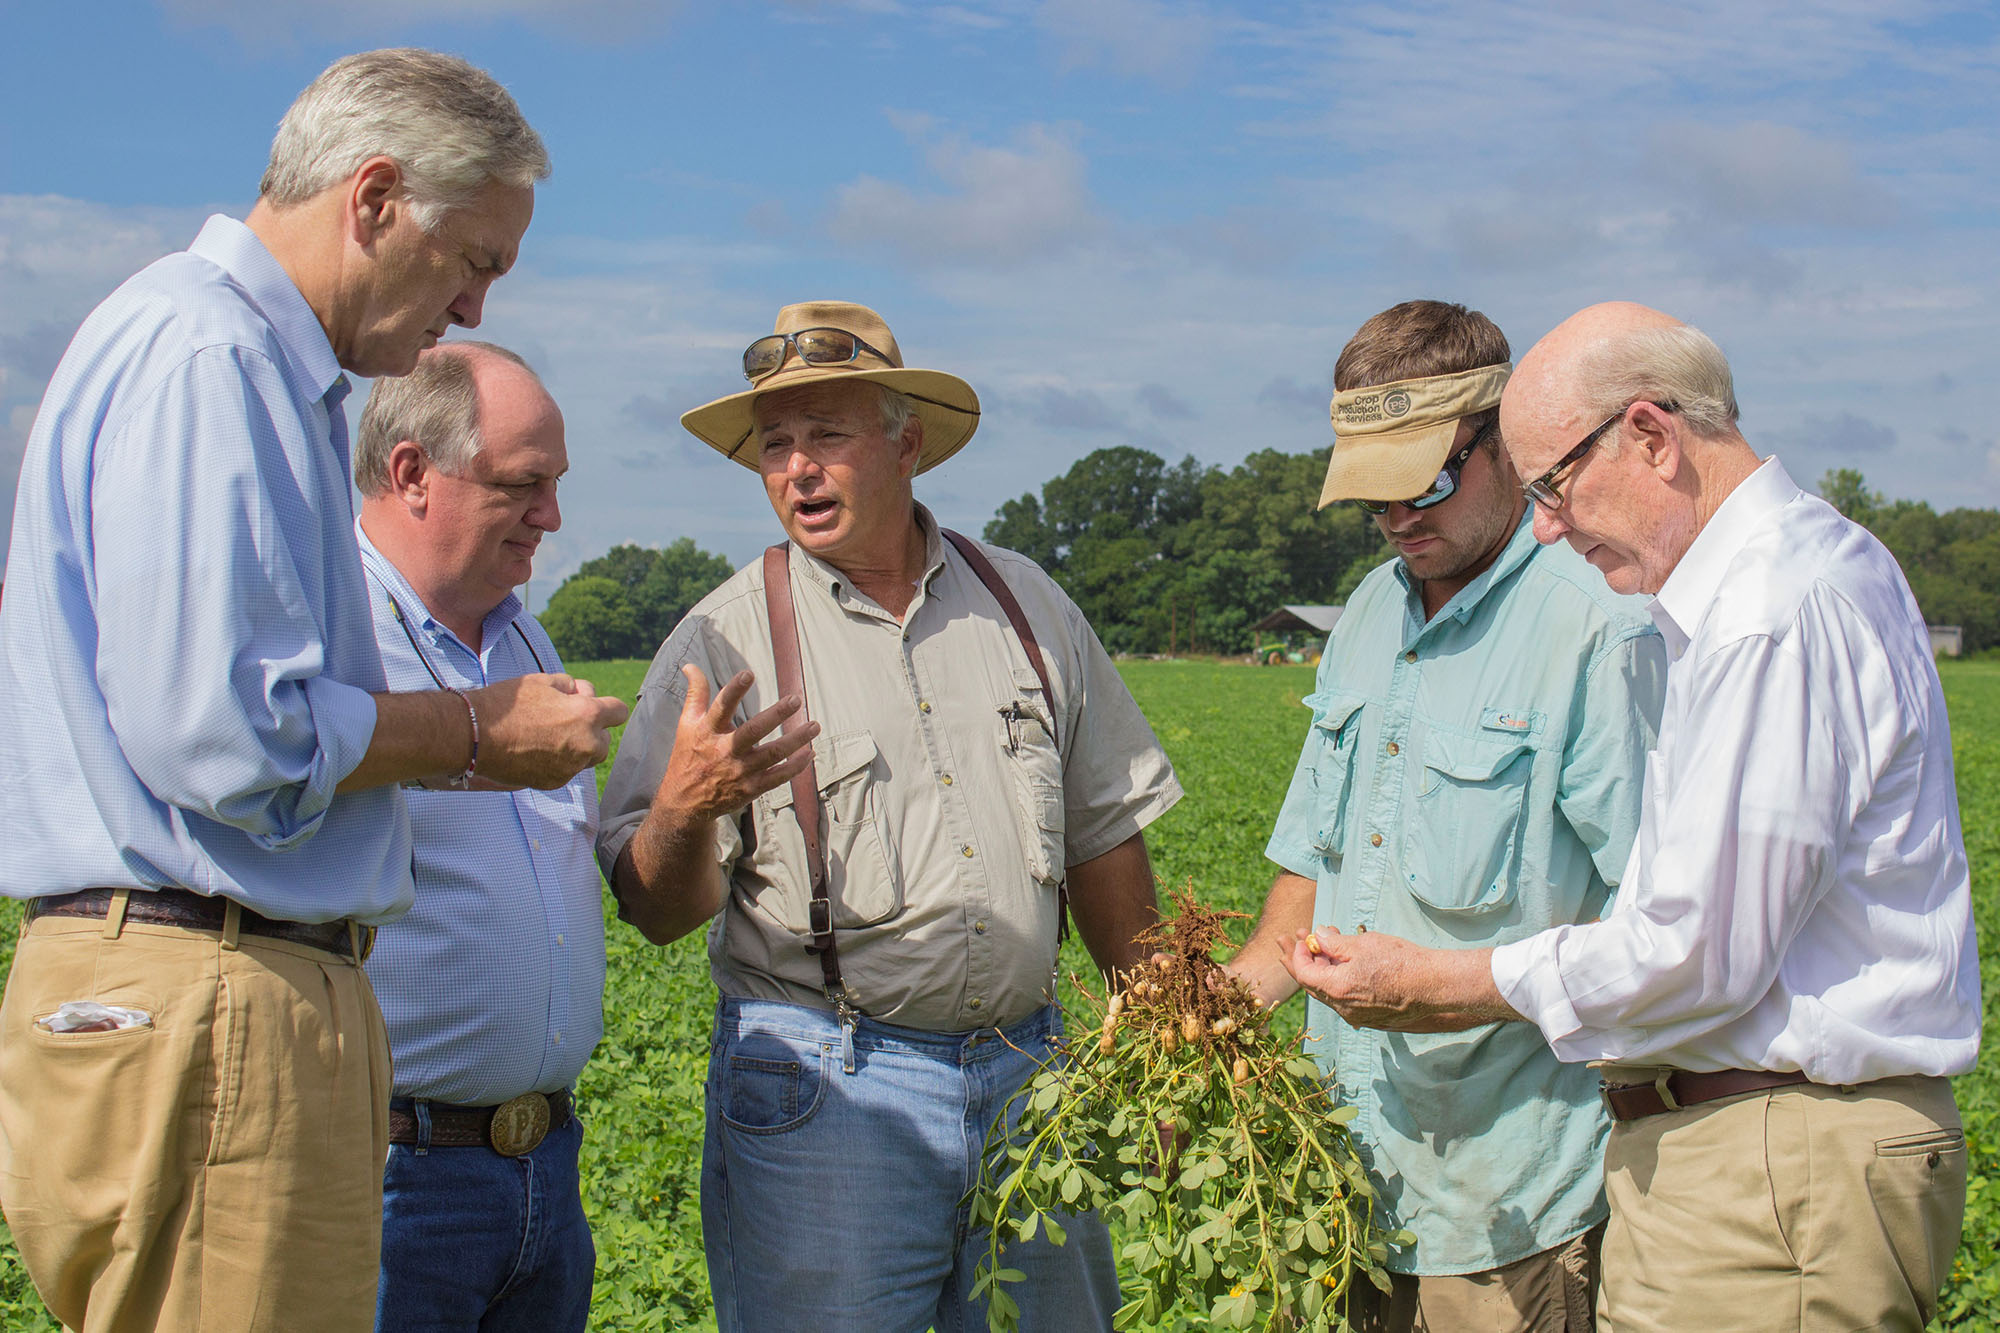 Roberts Strange farm tour